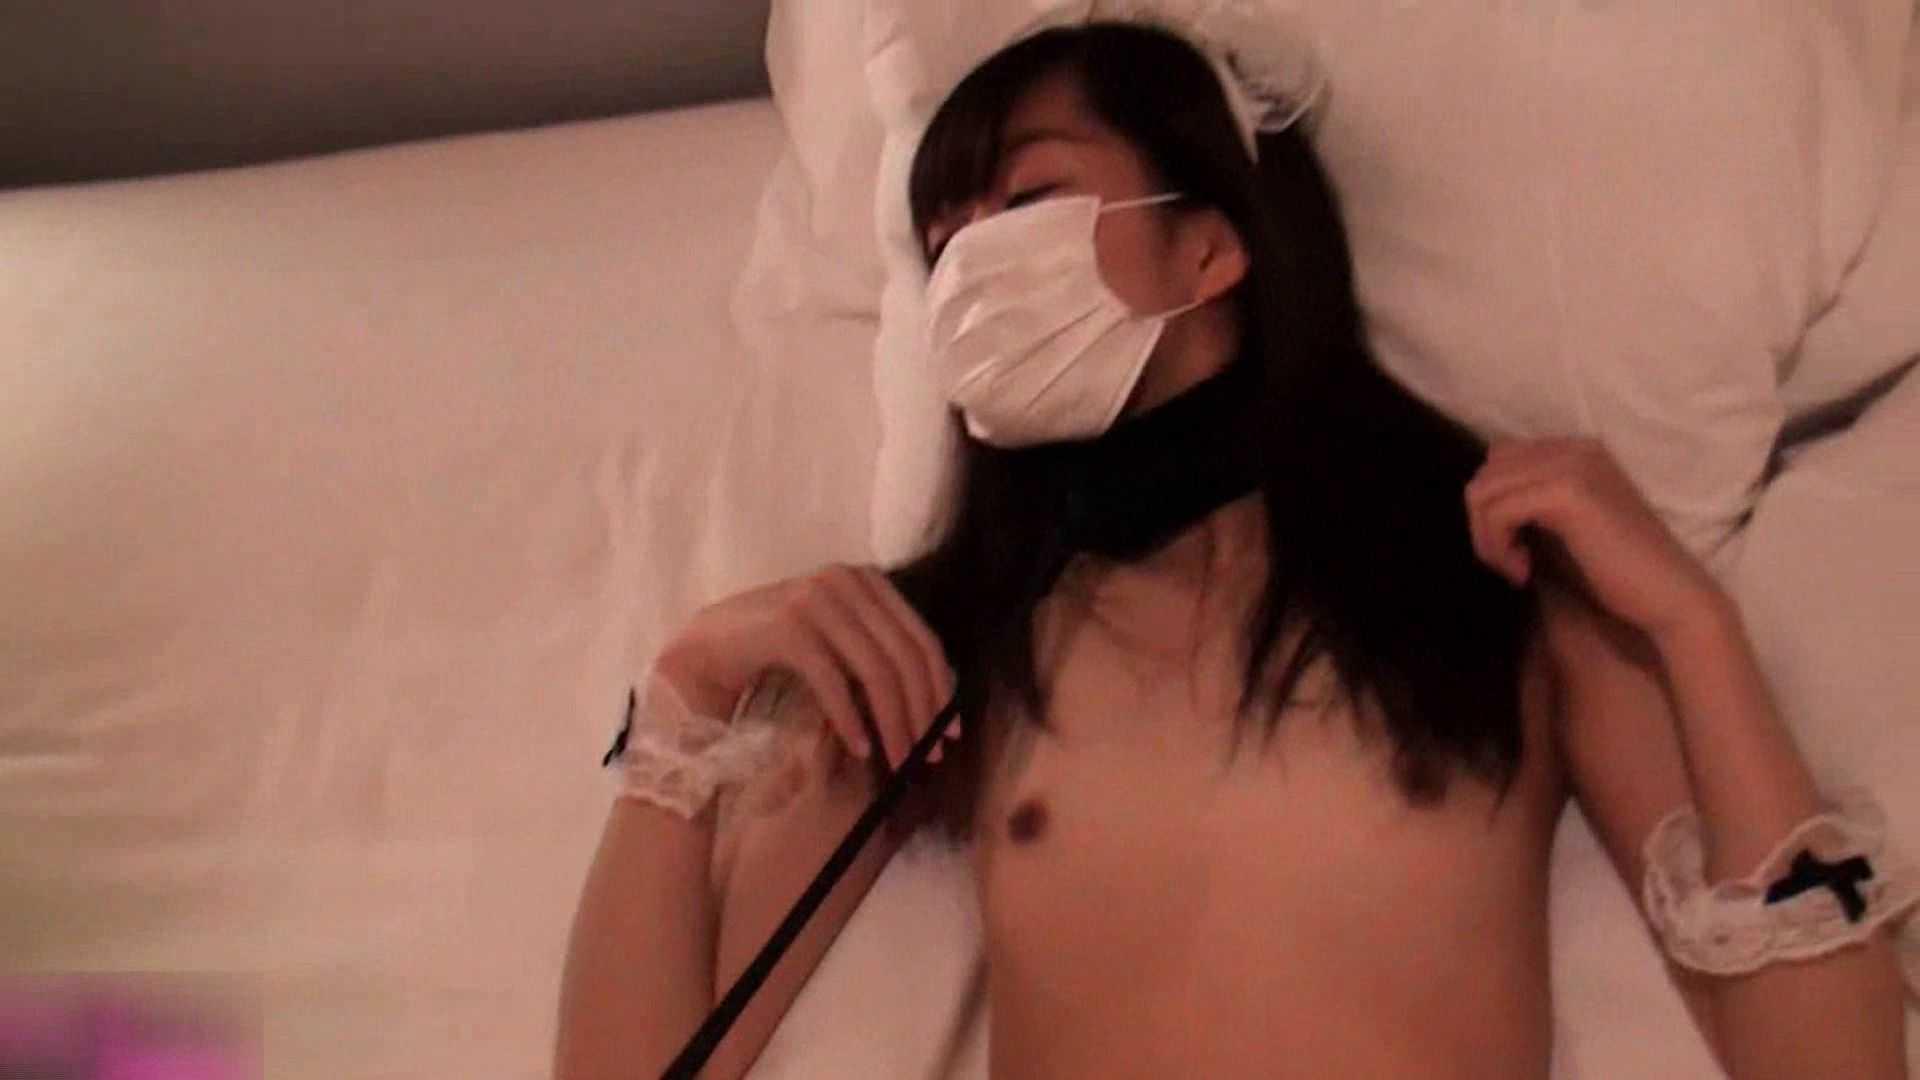 S級厳選美女ビッチガールVol.23 セックス  103枚 51